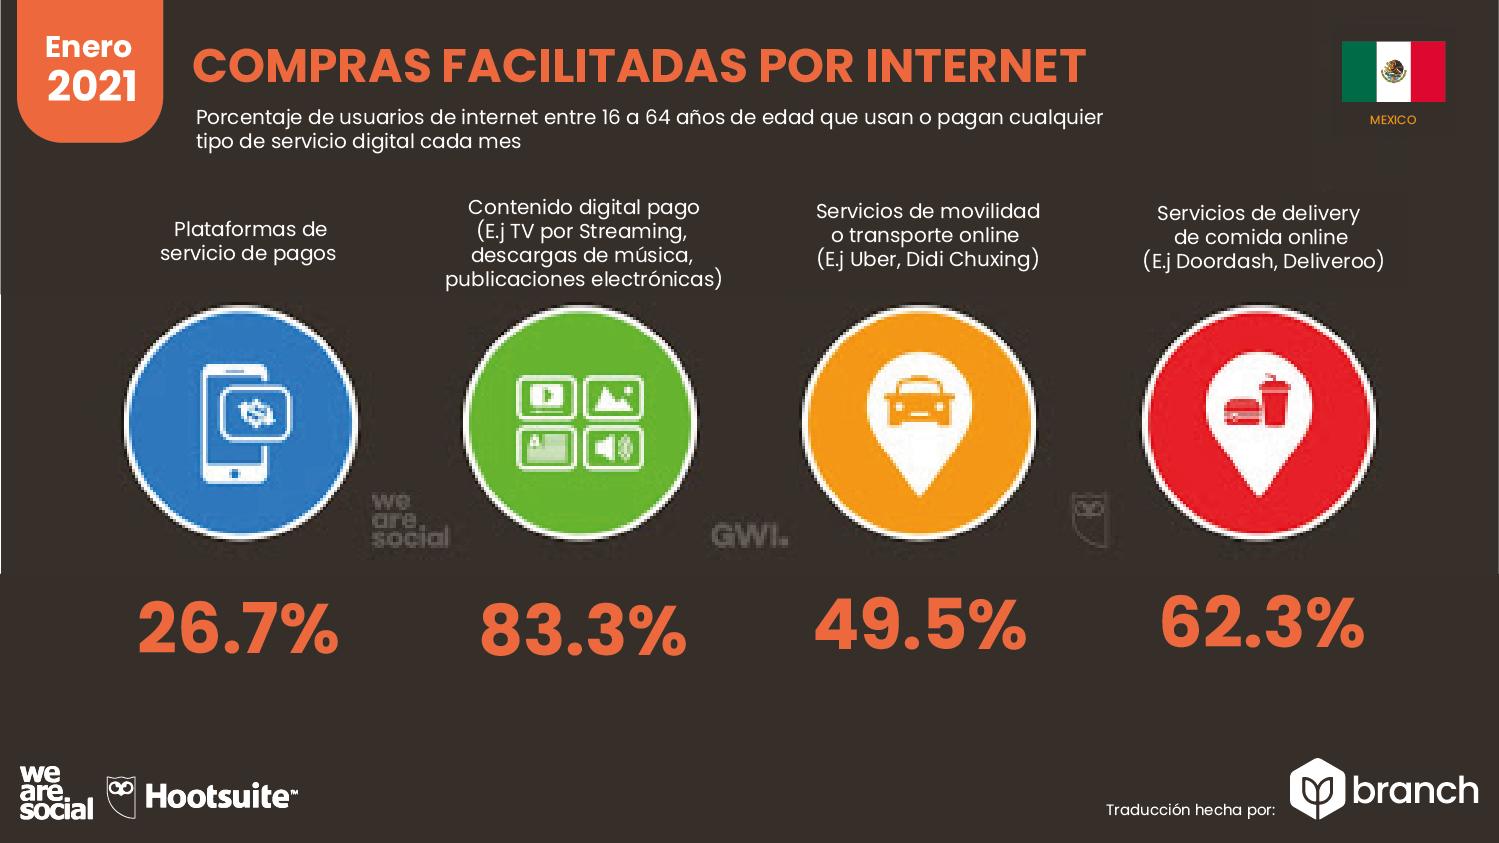 compras-facilitadas-por-internet-mexico-2020-2021